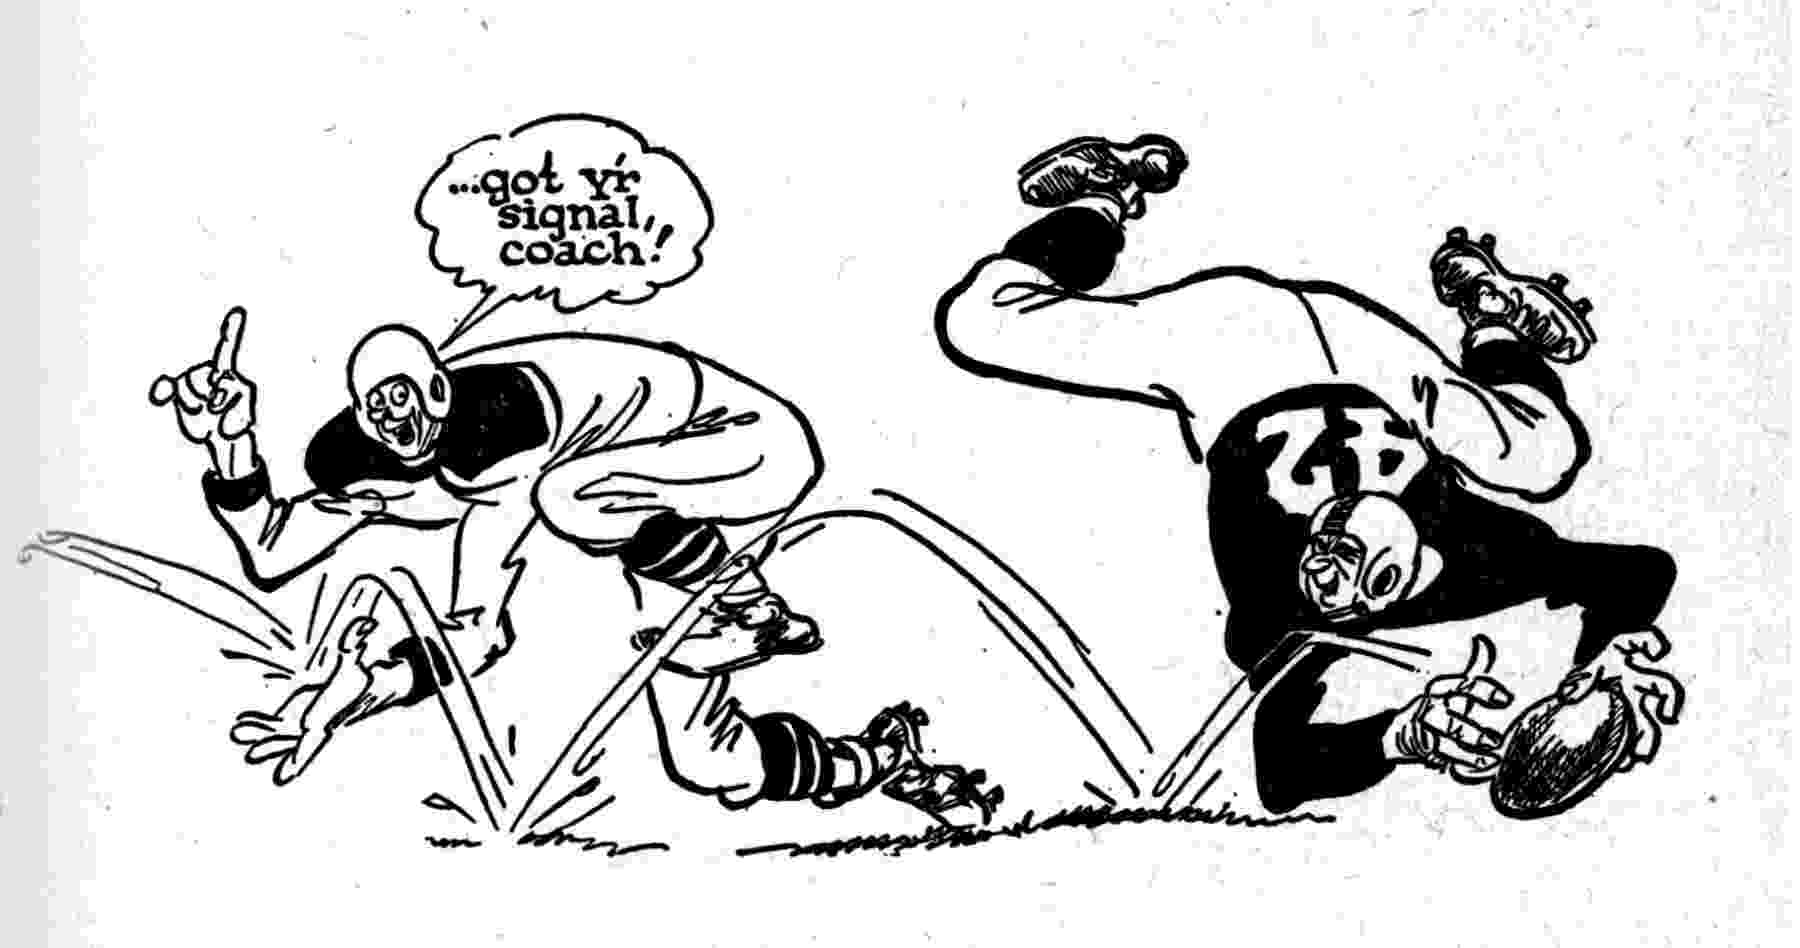 football player cartoon cartoon snap baseball and football cartoons by willard mullin player football cartoon 1 1